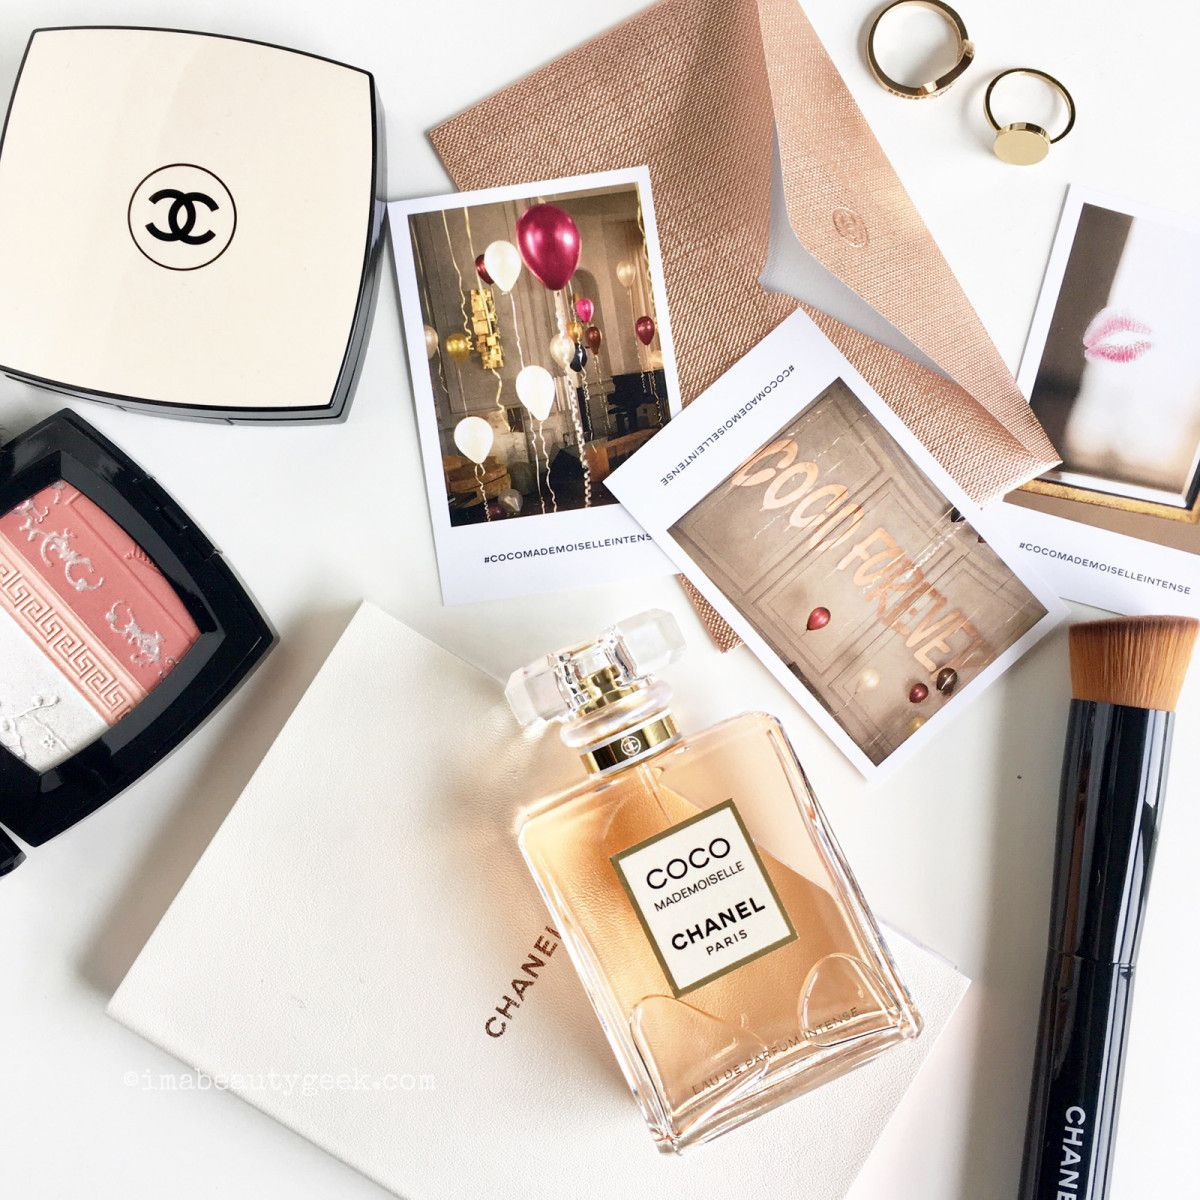 Nước hoa Chanel Coco Mademoiselle Intense EDP